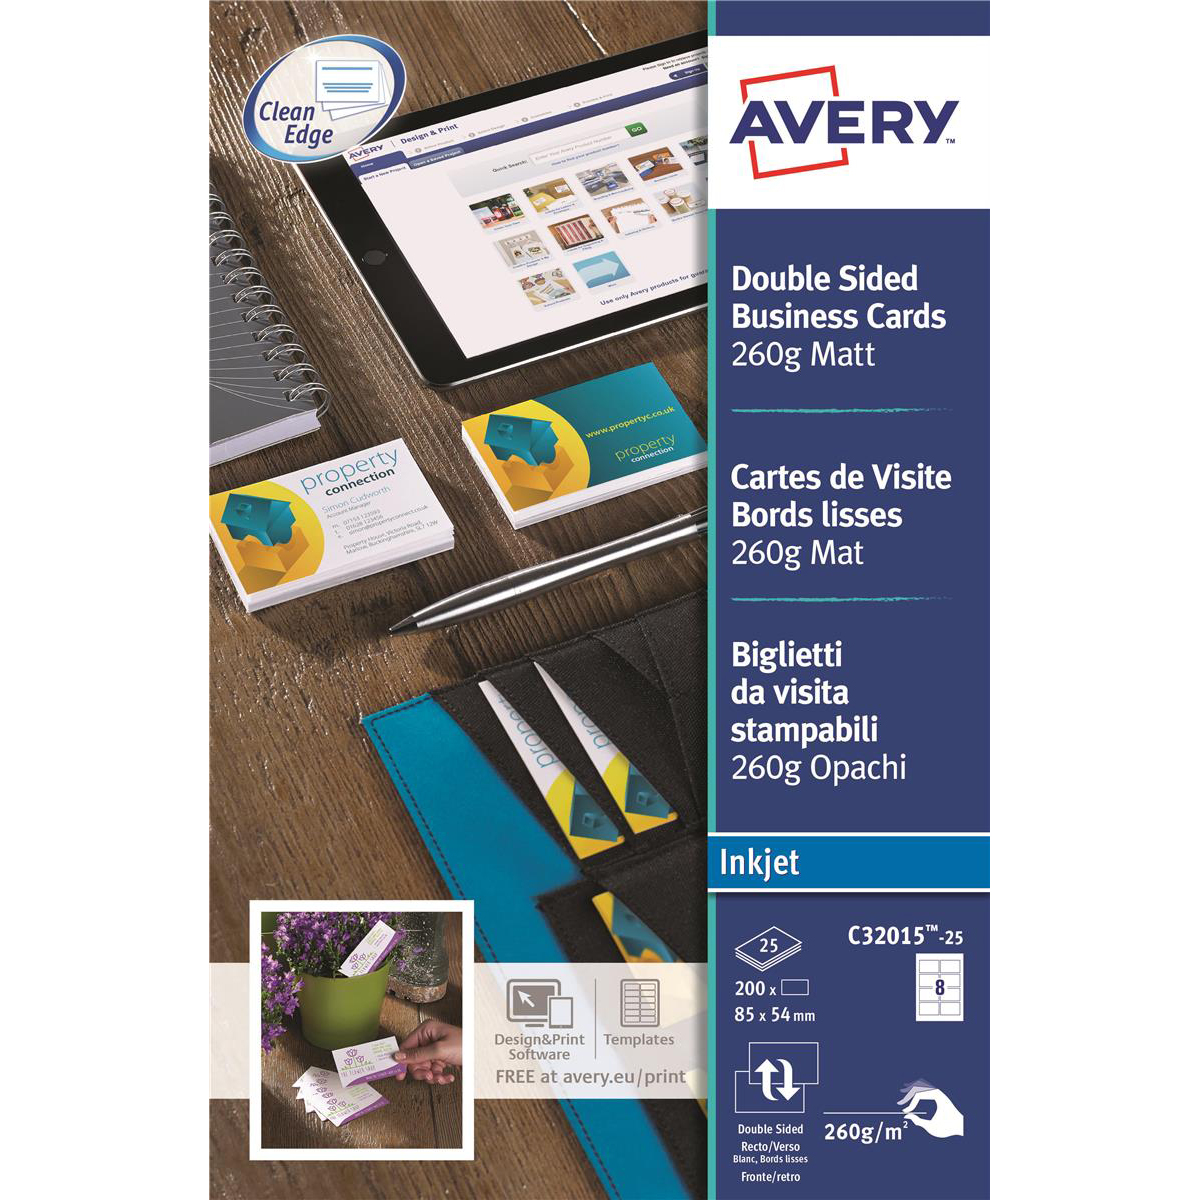 Avery Quick And Clean Business Cards Inkjet 260gsm 8 Per Sheet Matt